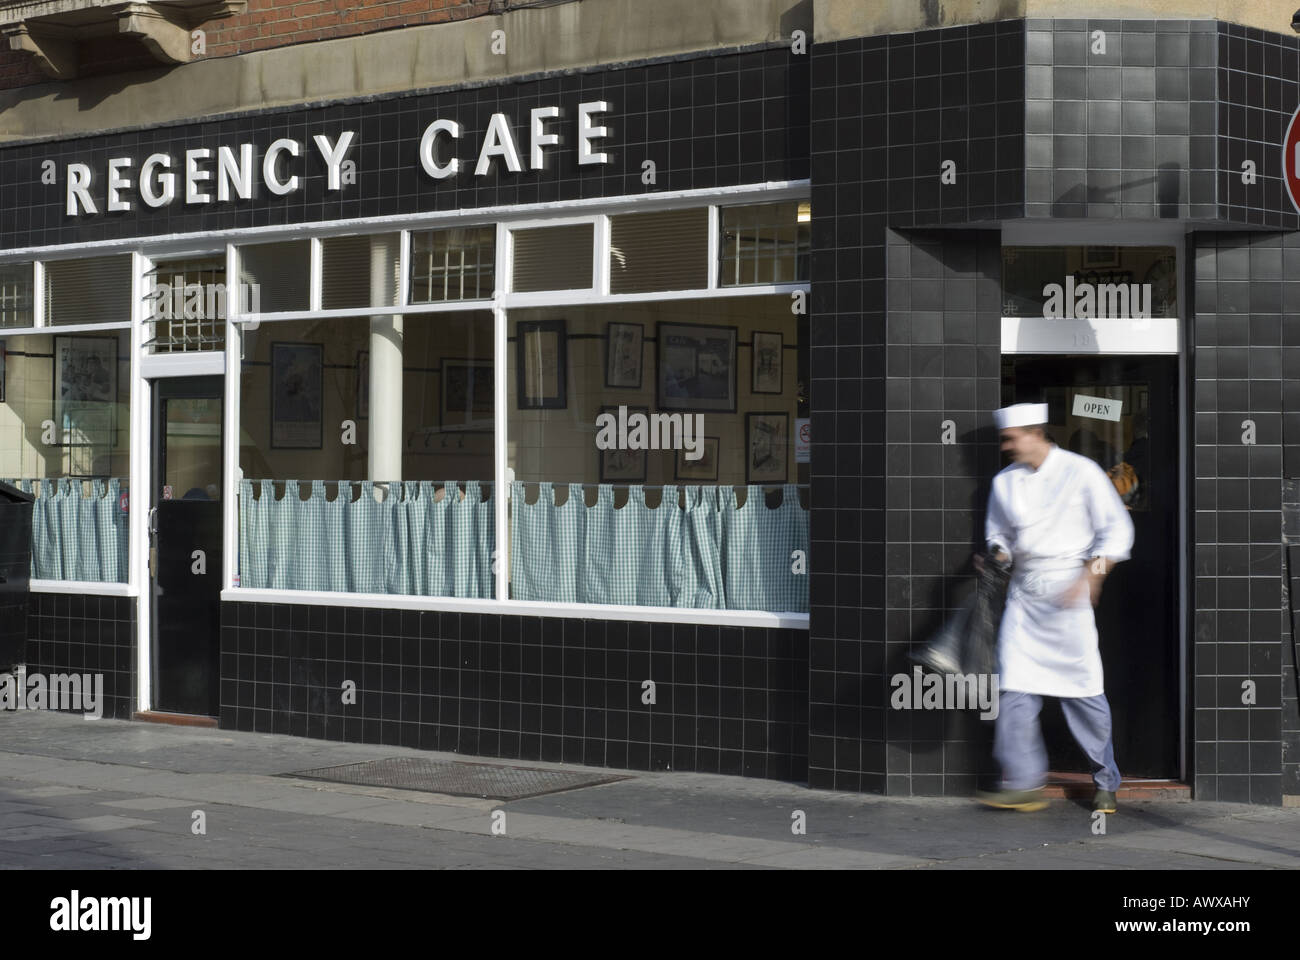 Regency Cafe Westminster Stock Photos & Regency Cafe